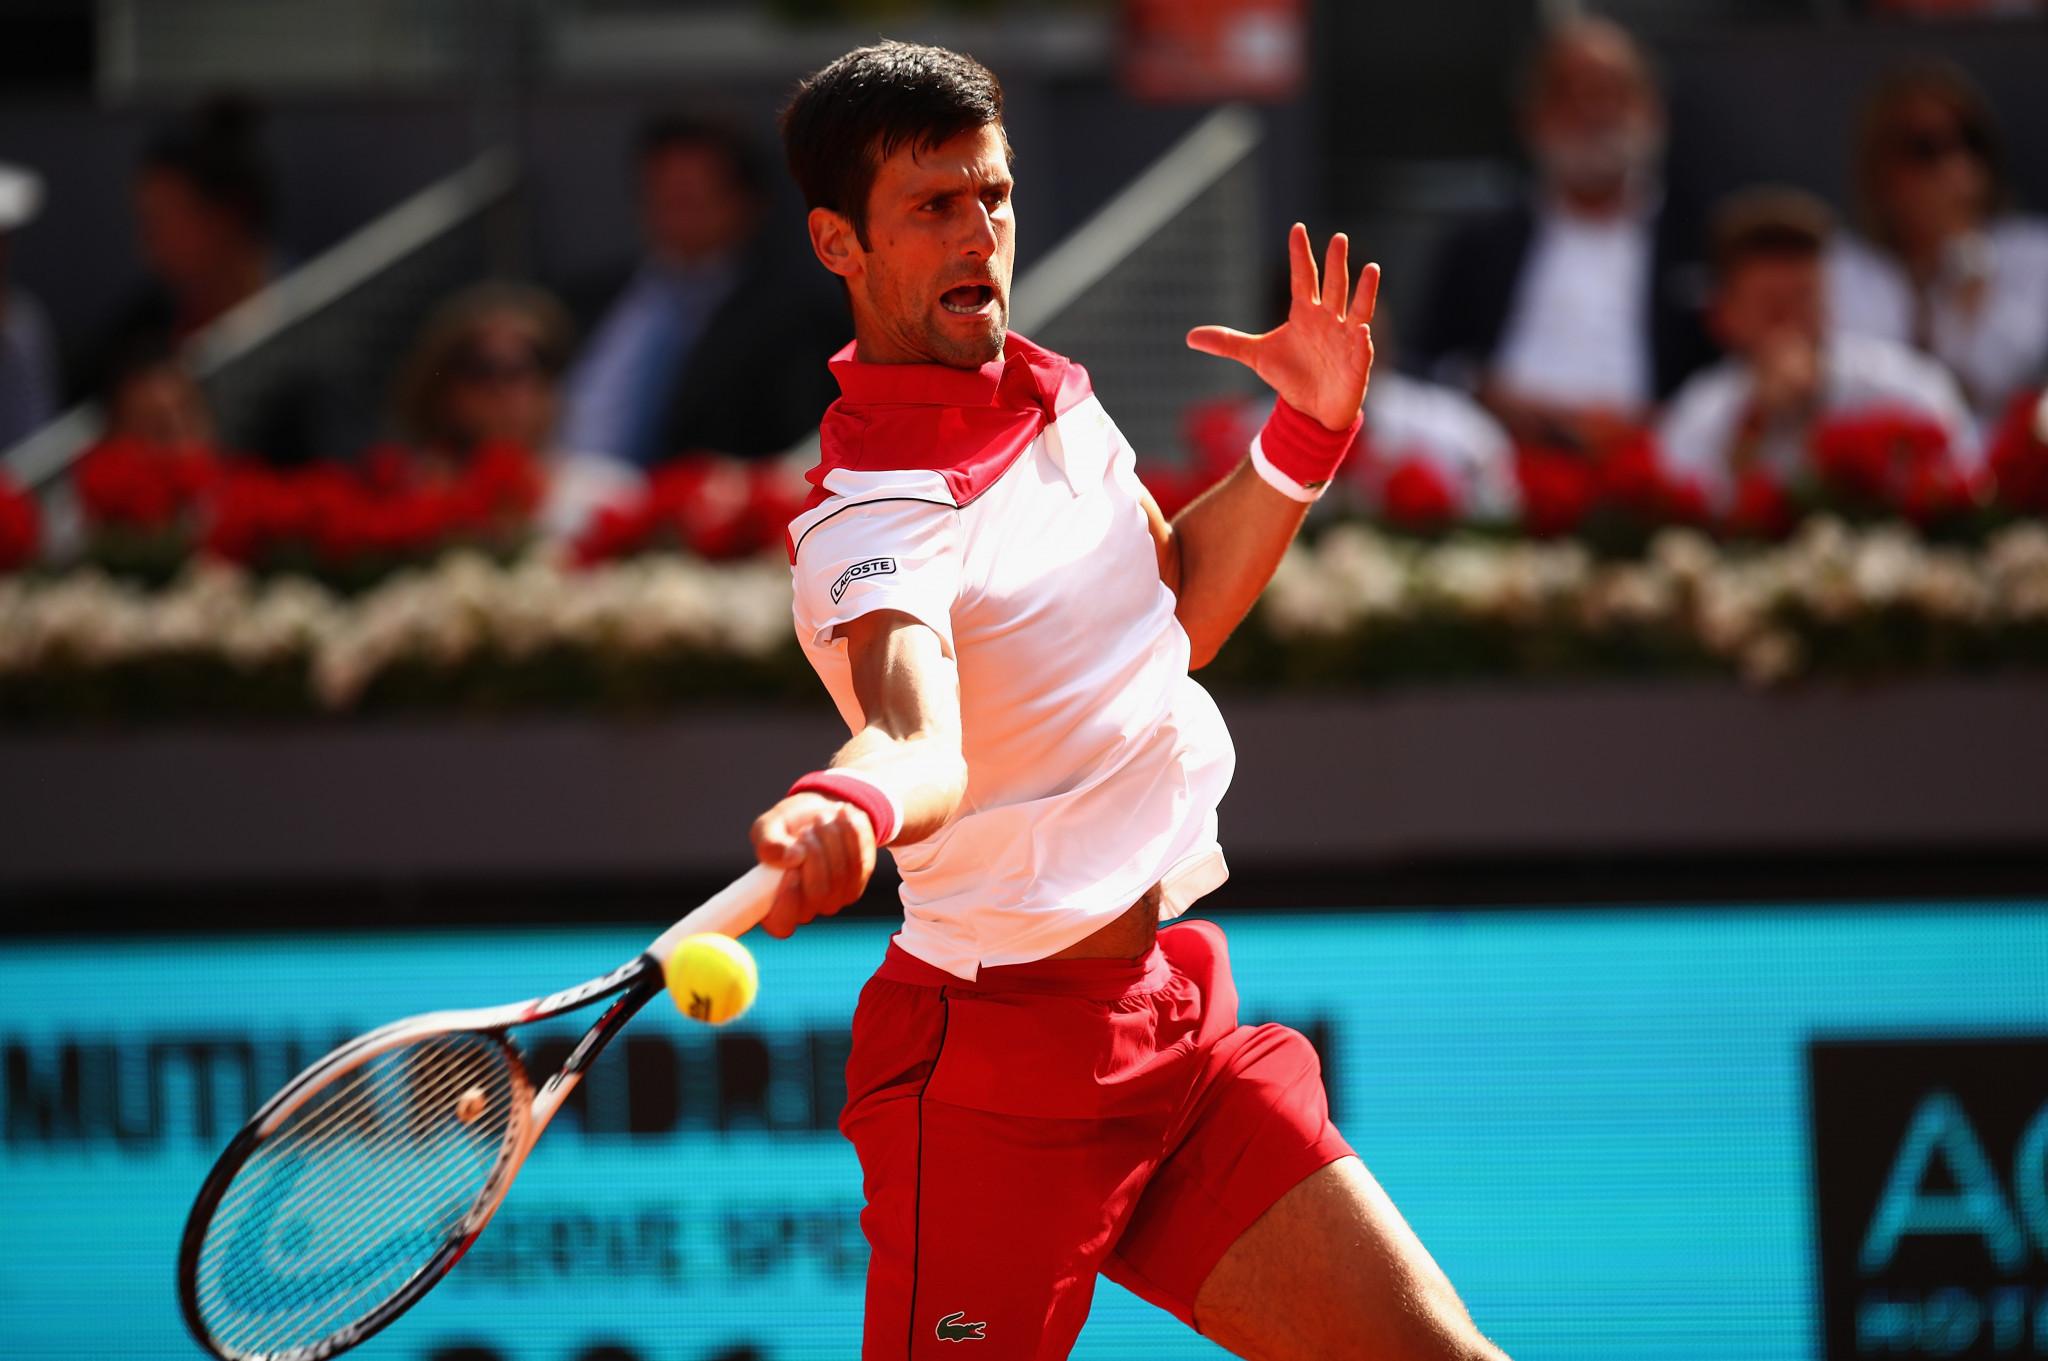 Djokovic rediscovers form with victory over Nishikori at Mutua Madrid Open